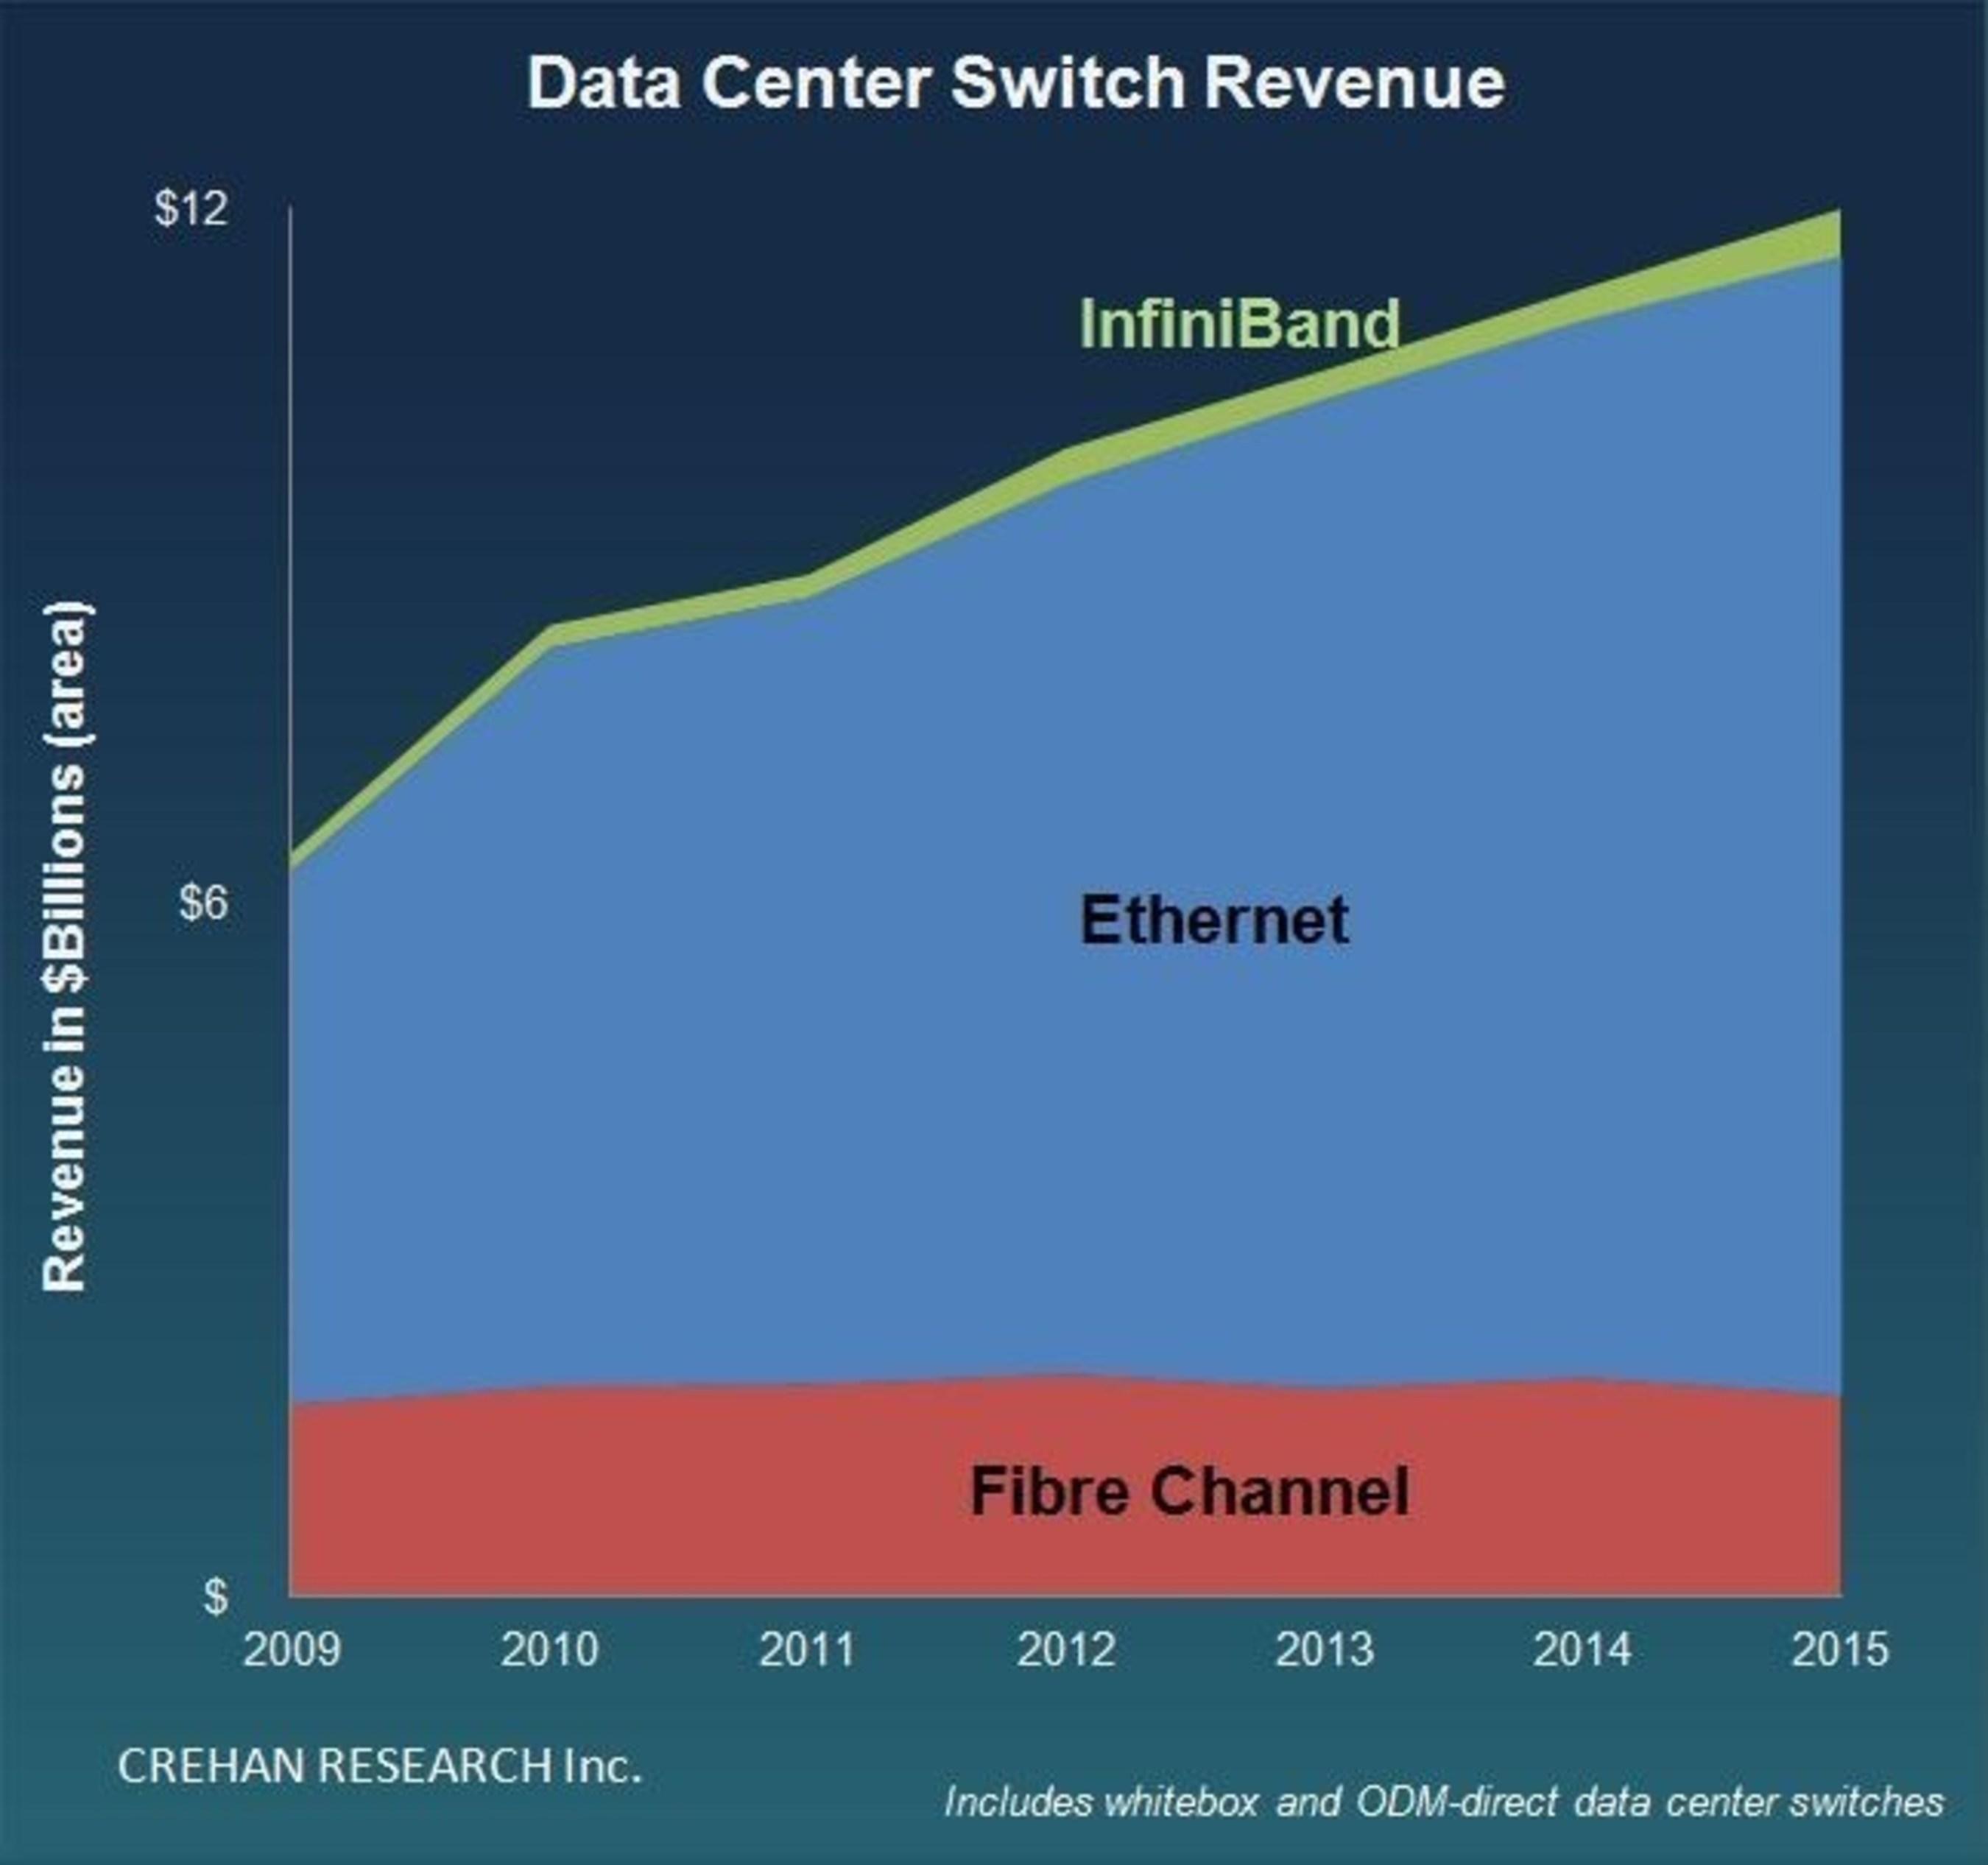 CREHAN RESEARCH: Data Center Switch Revenue